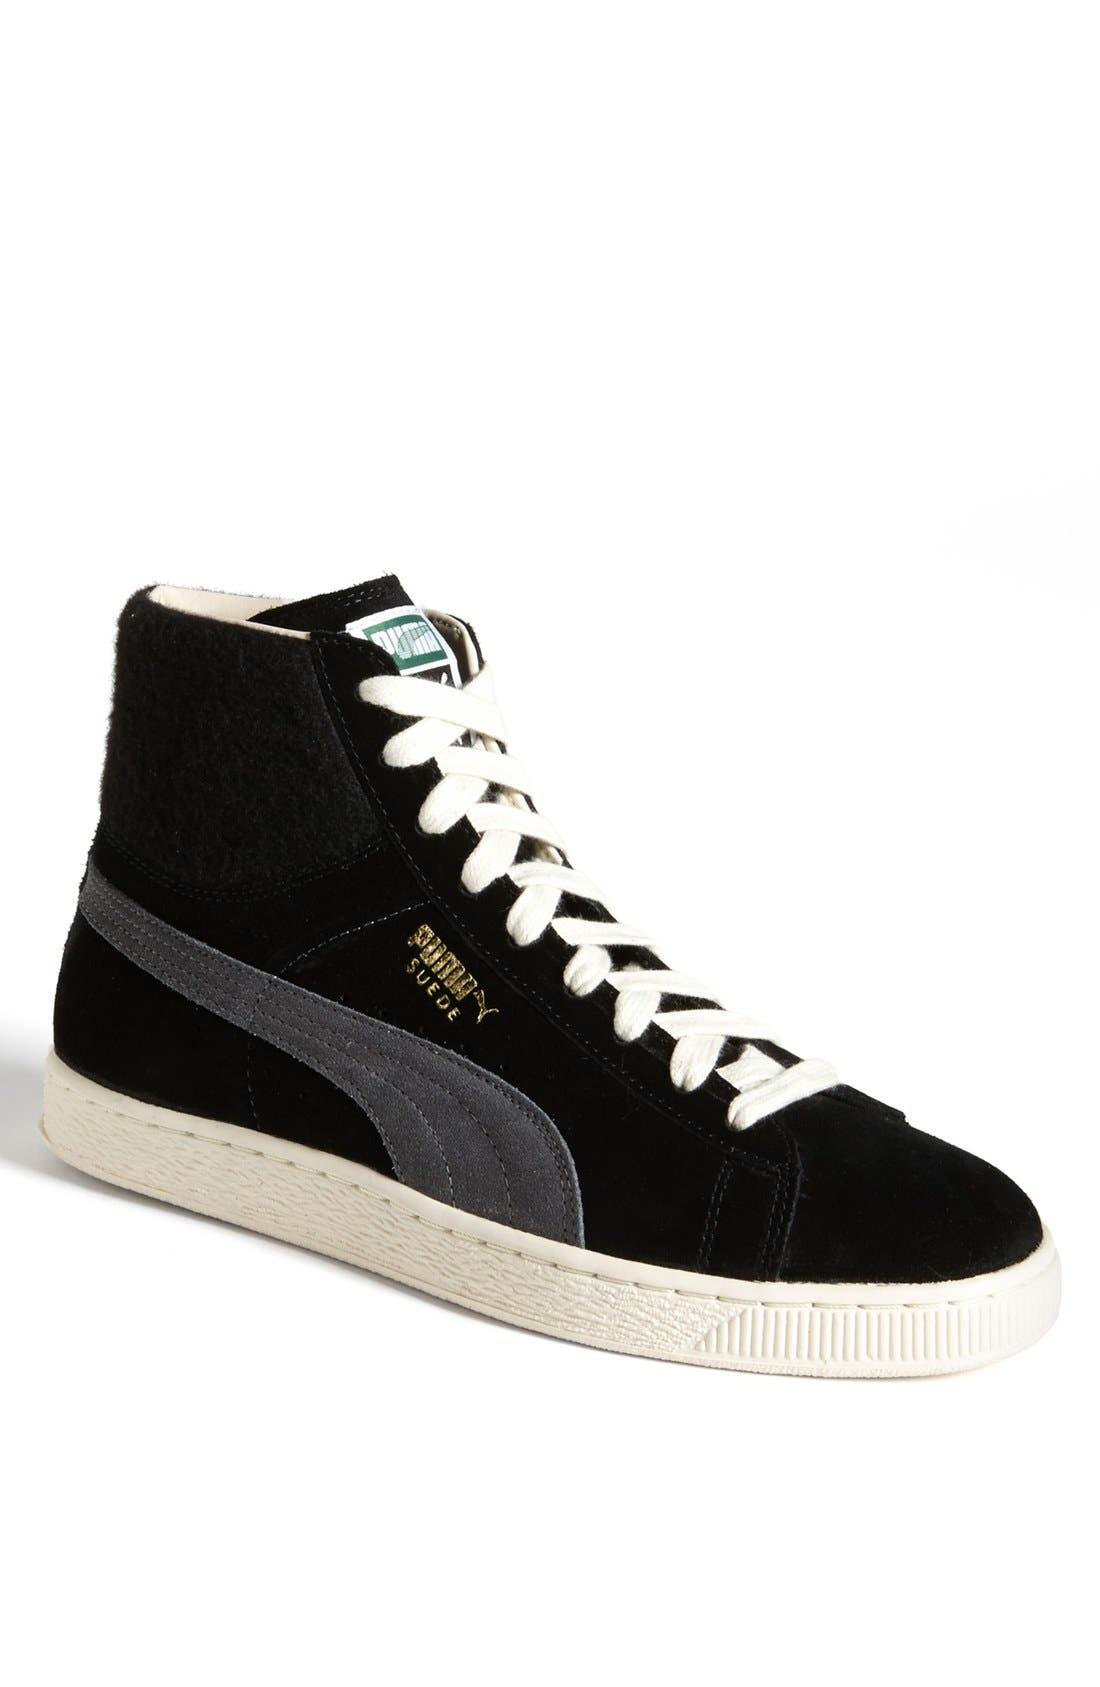 Alternate Image 1 Selected - PUMA 'Suede City Mid' Sneaker